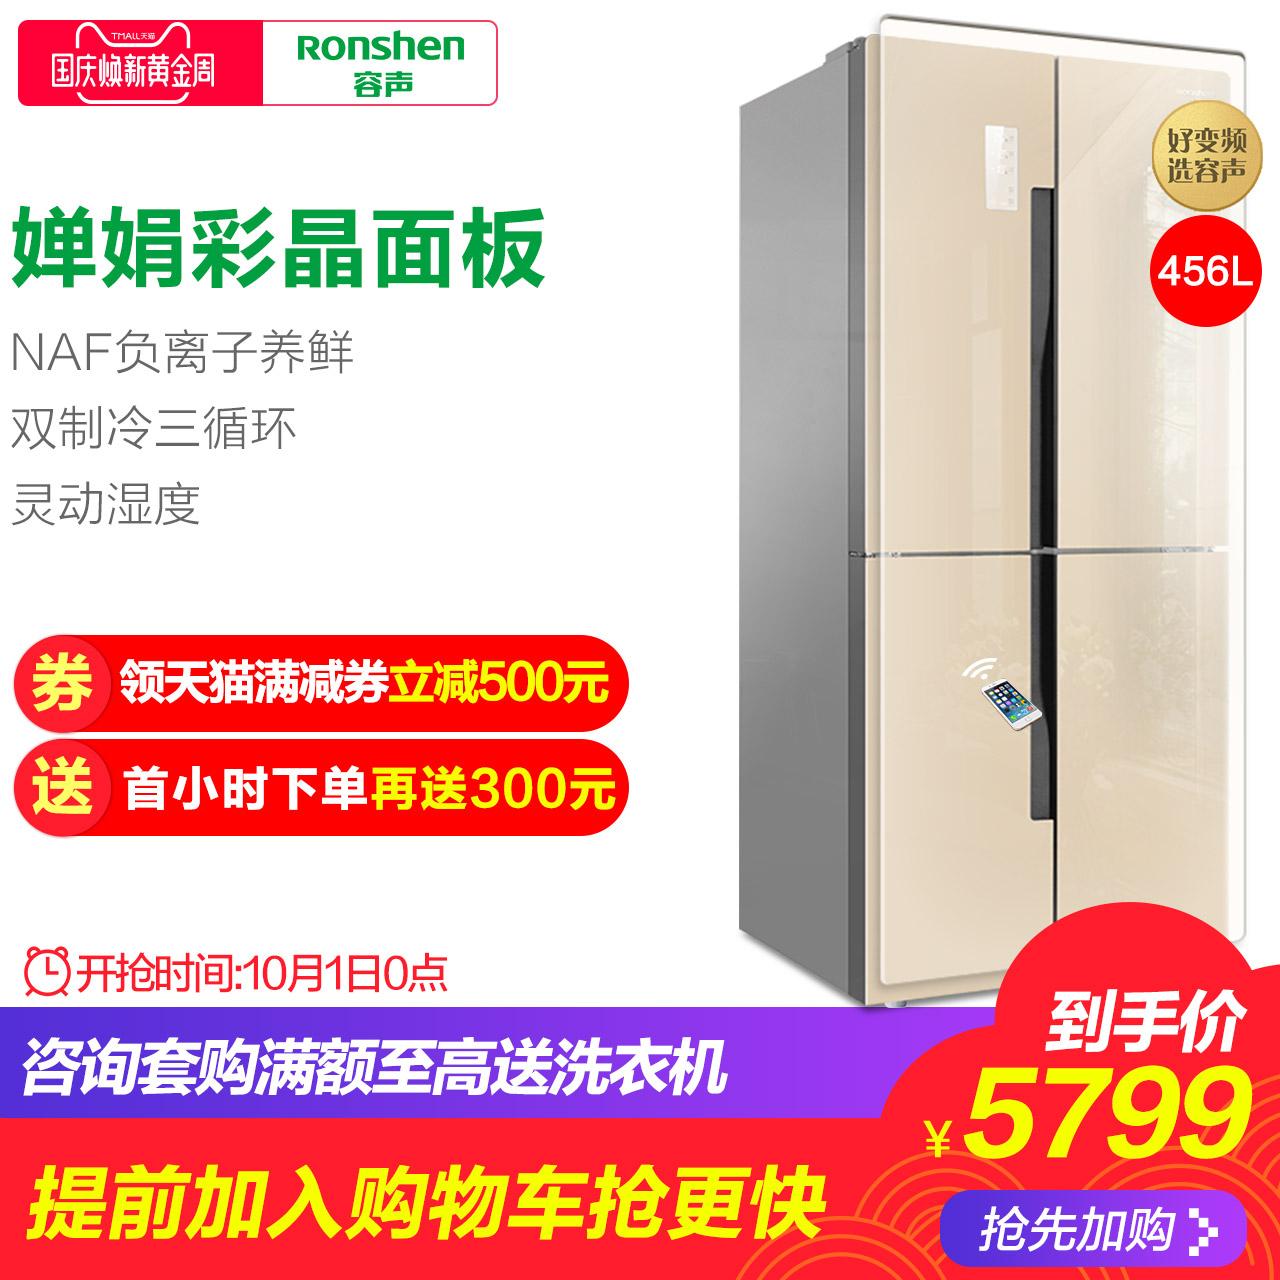 Ronshen-容声 BCD-456WD12FPAC多门四门变频电冰箱家用十字风冷